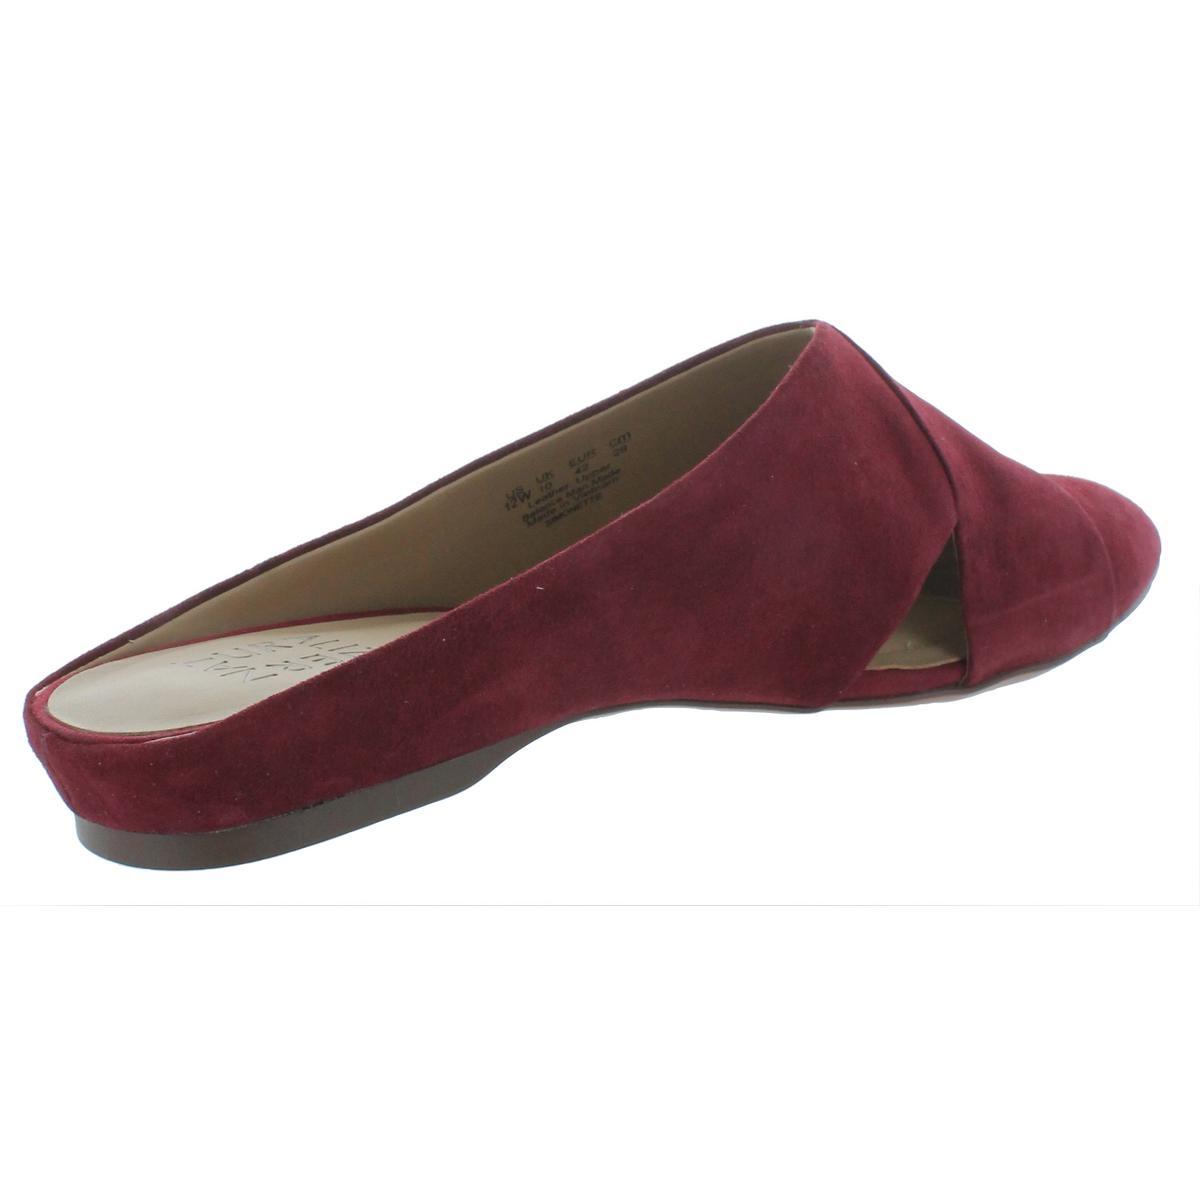 Naturalizer-Womens-Simonette-Solid-Dress-Pointed-Toe-Mules-Flats-BHFO-4339 thumbnail 4